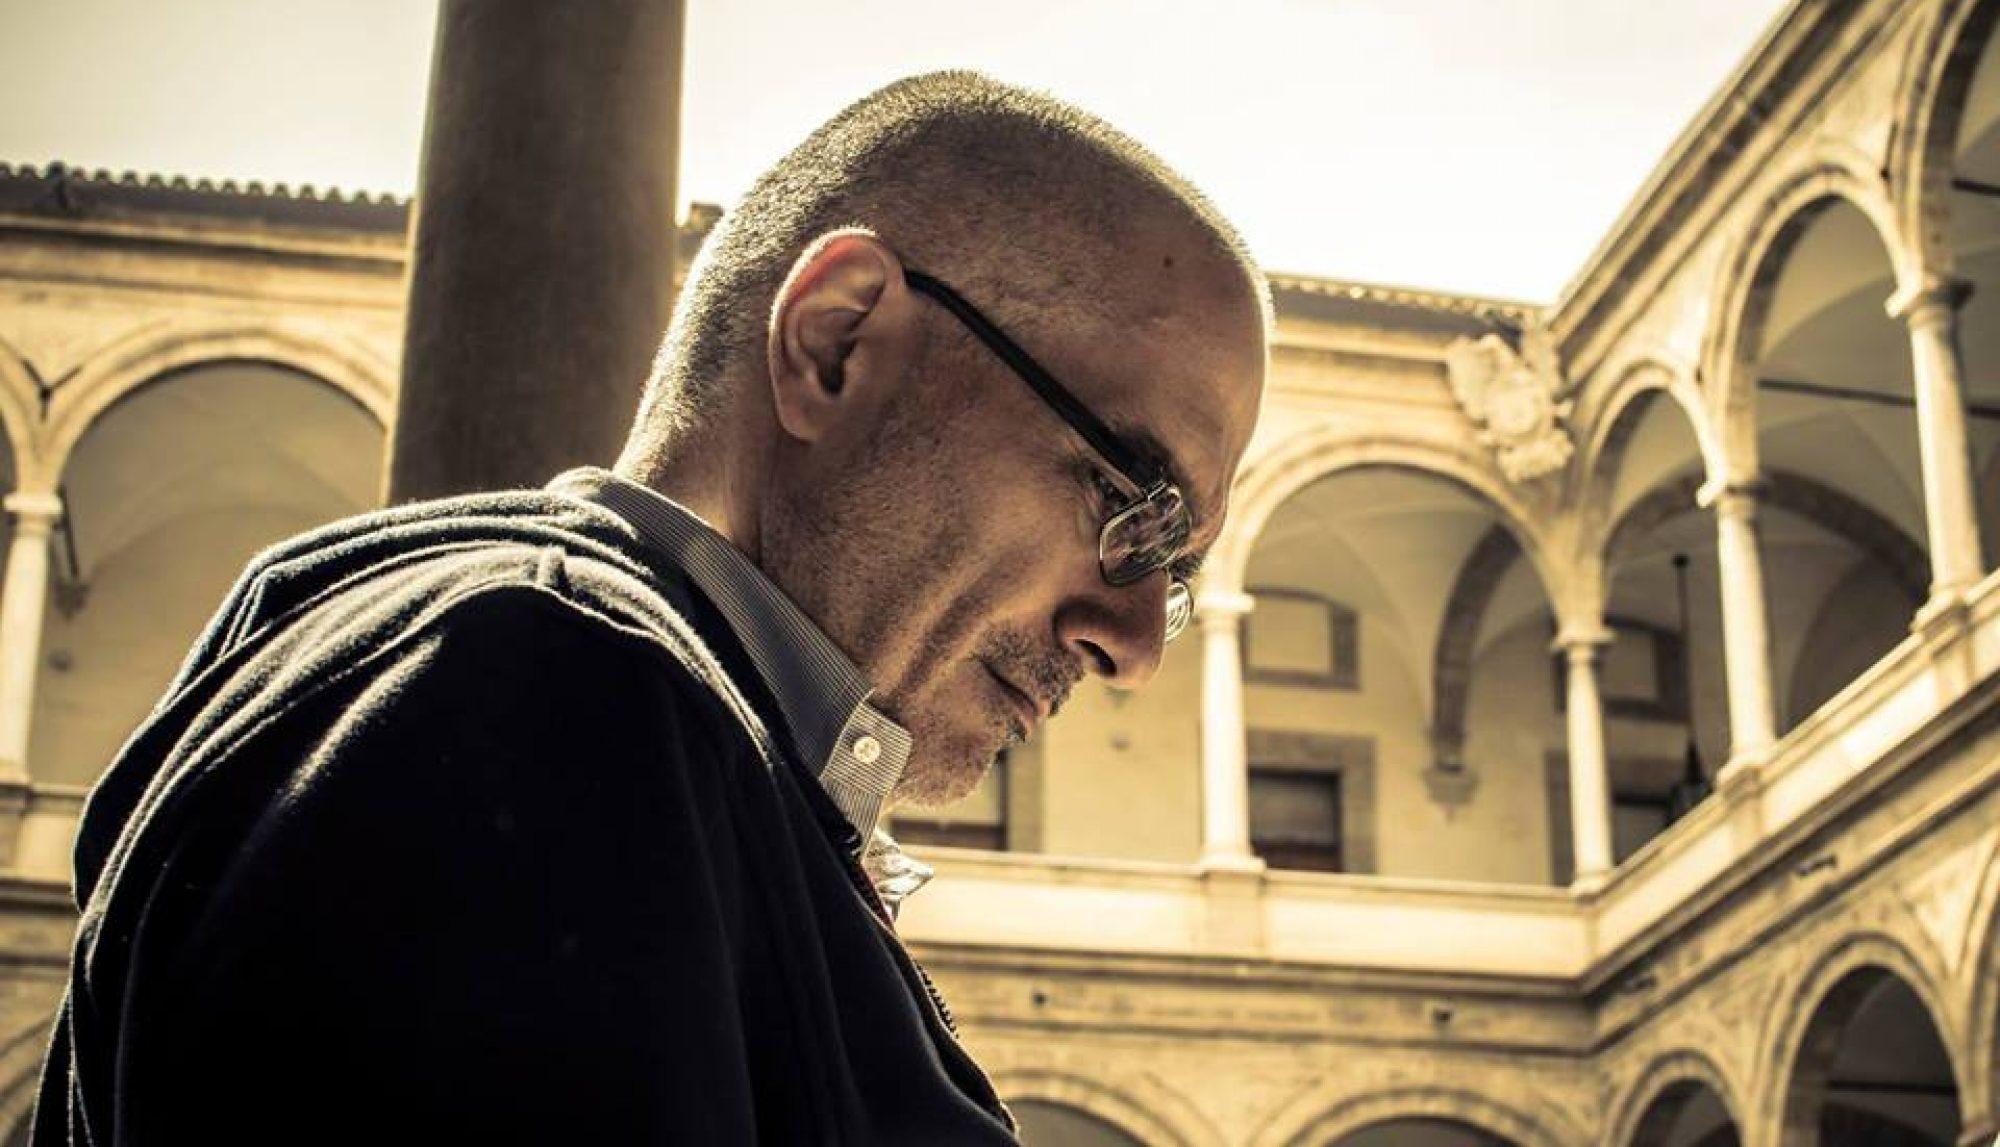 www.pellegrinoconte.com